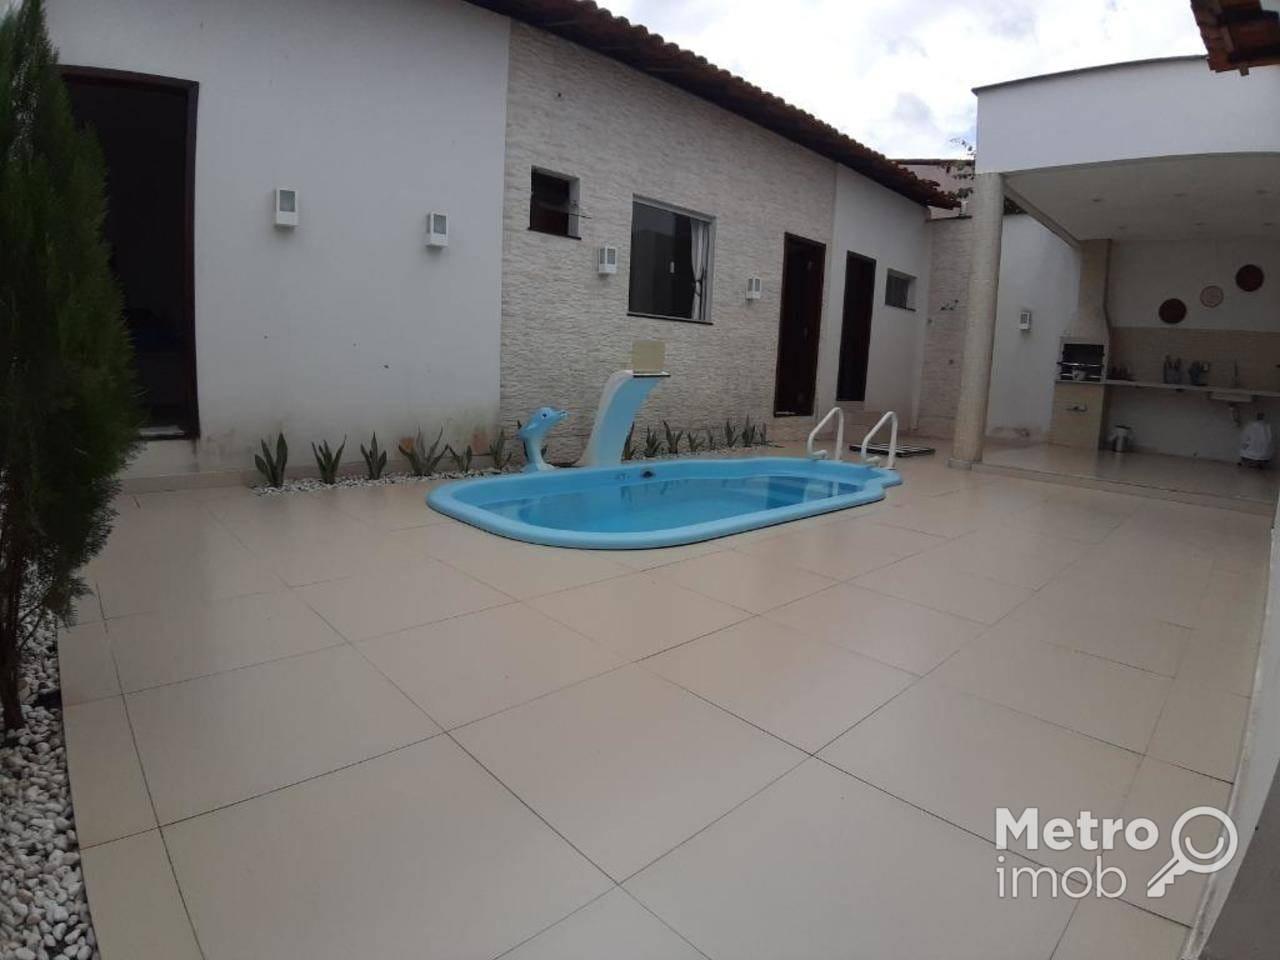 https://static.arboimoveis.com.br/VL0007_METRO/village-a-venda-cohama-sao-luis1630430163187yempr.jpg